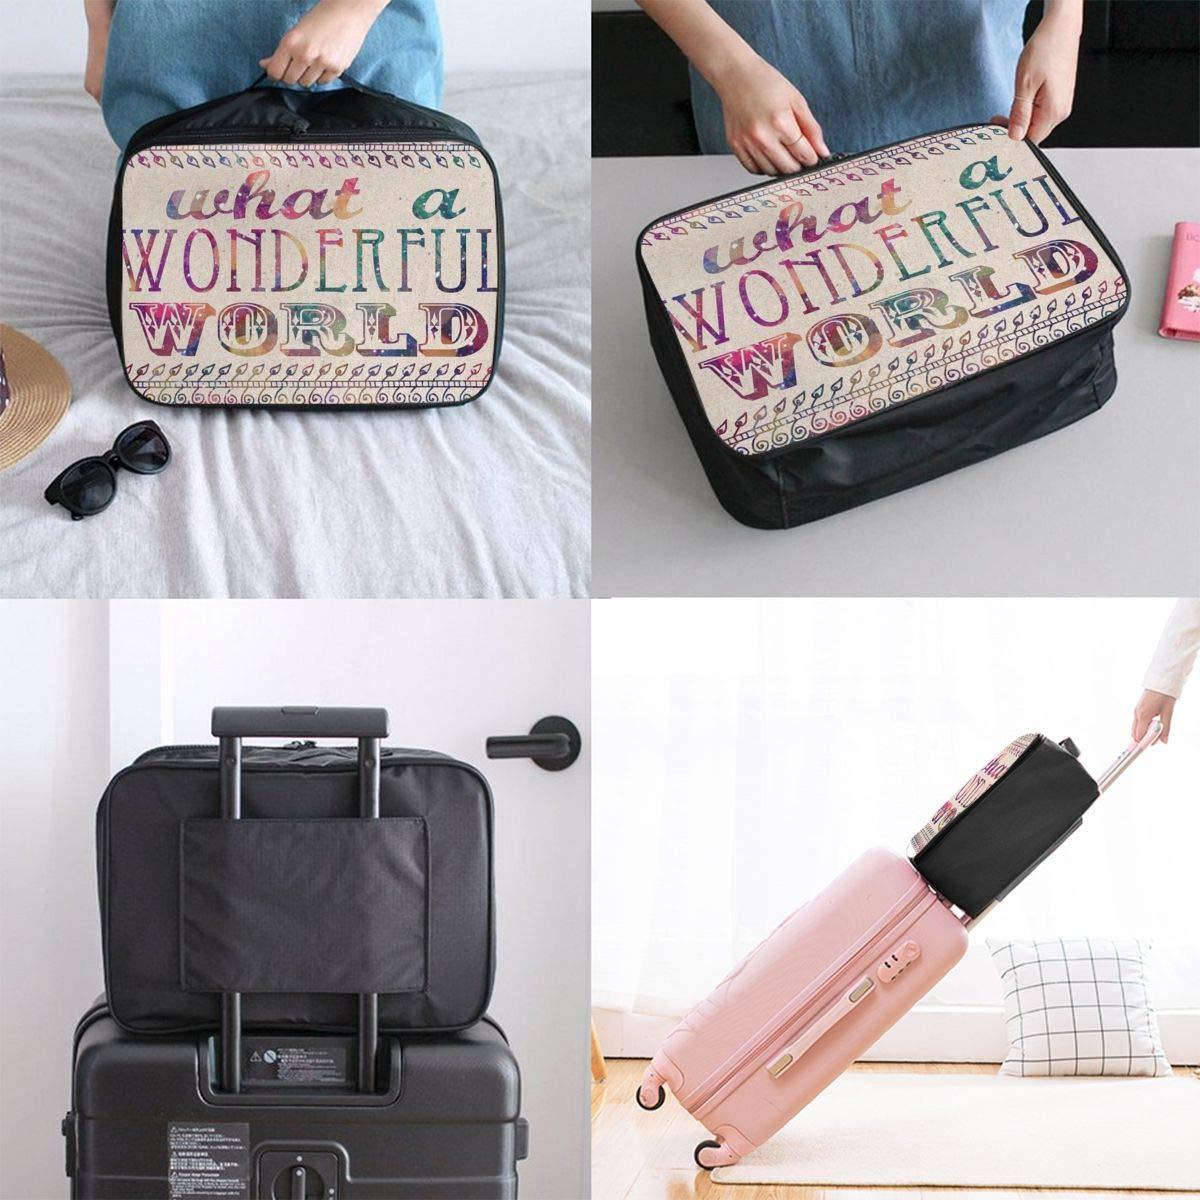 ADGAI English What A Wonderful World Canvas Travel Weekender Bag,Fashion Custom Lightweight Large Capacity Portable Luggage Bag,Suitcase Trolley Bag